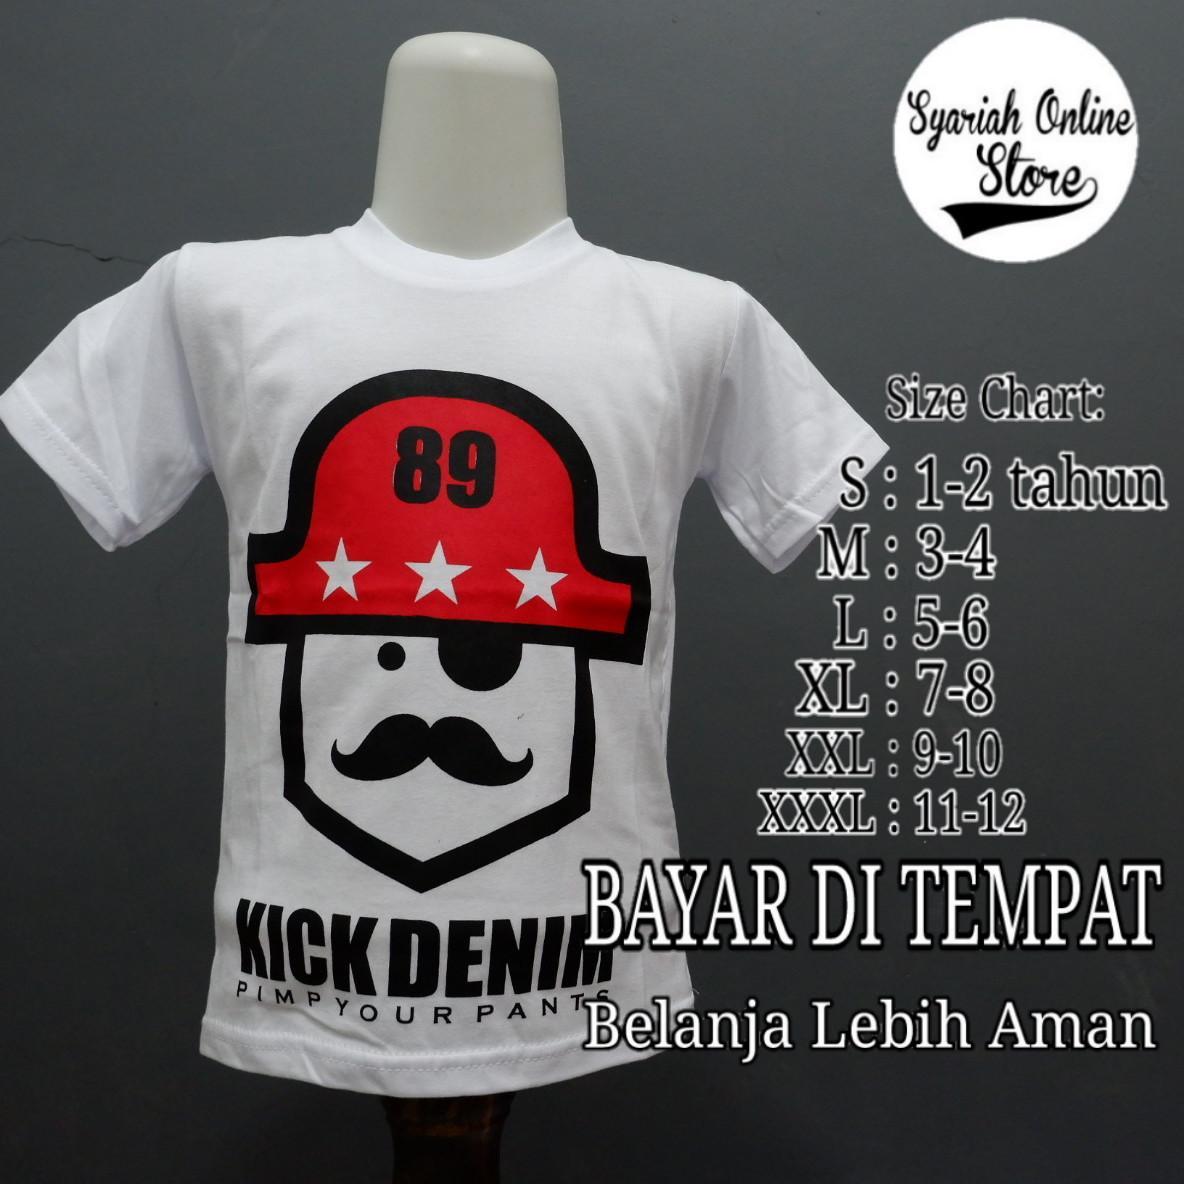 Kaos/baju Anak Motif Distro Kick Denim By Syariah Online Store.